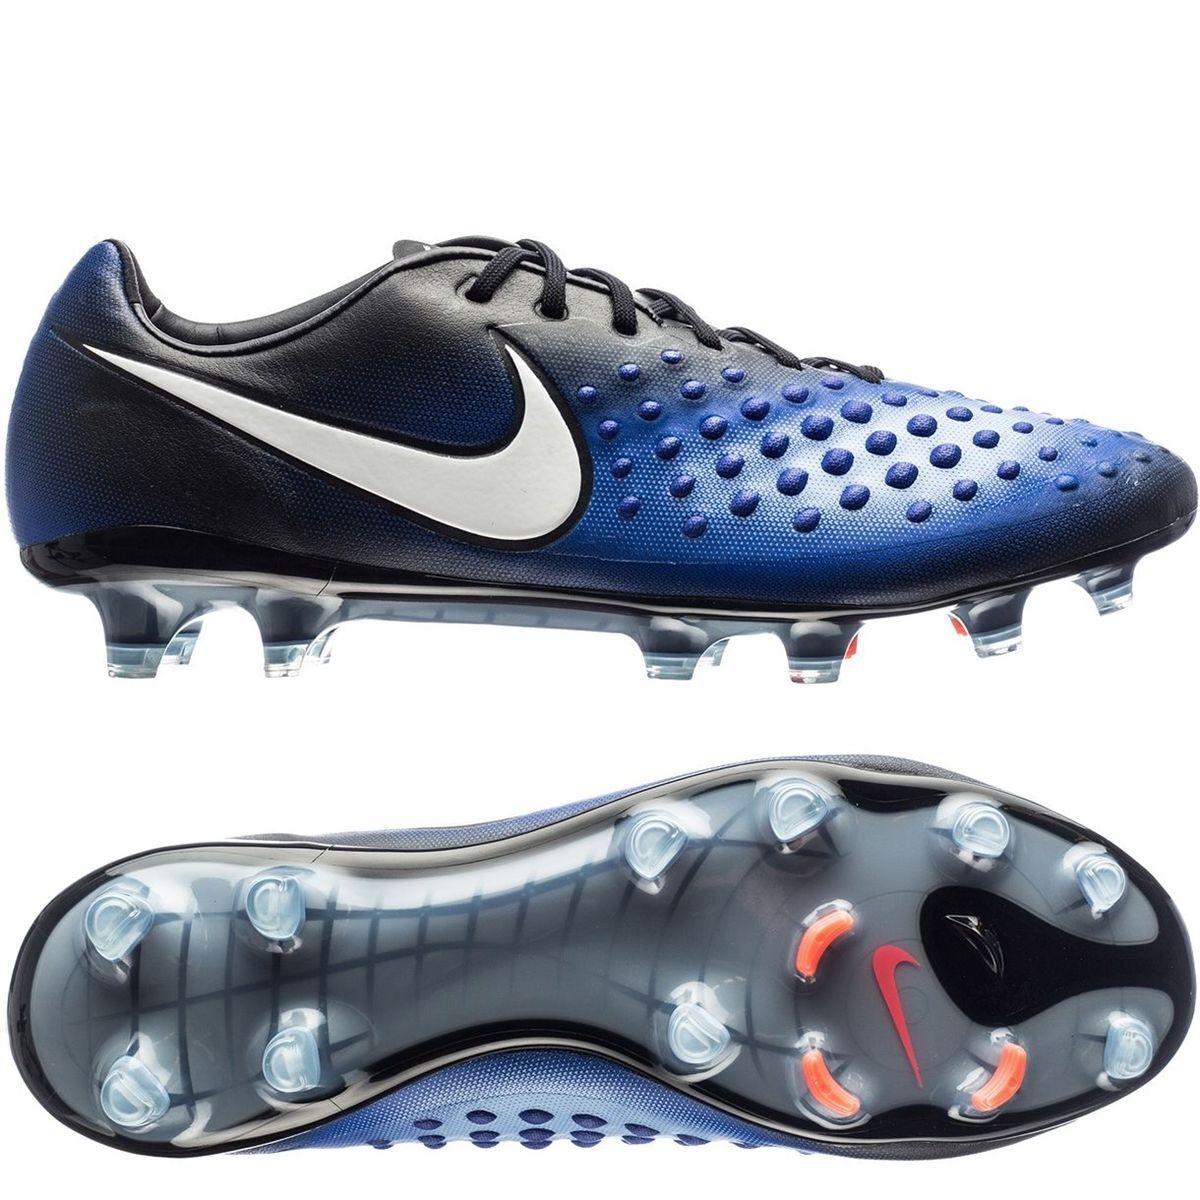 Nike Magista Opus II FG Botines botas Talla 8 Azul Negro [843813-018]